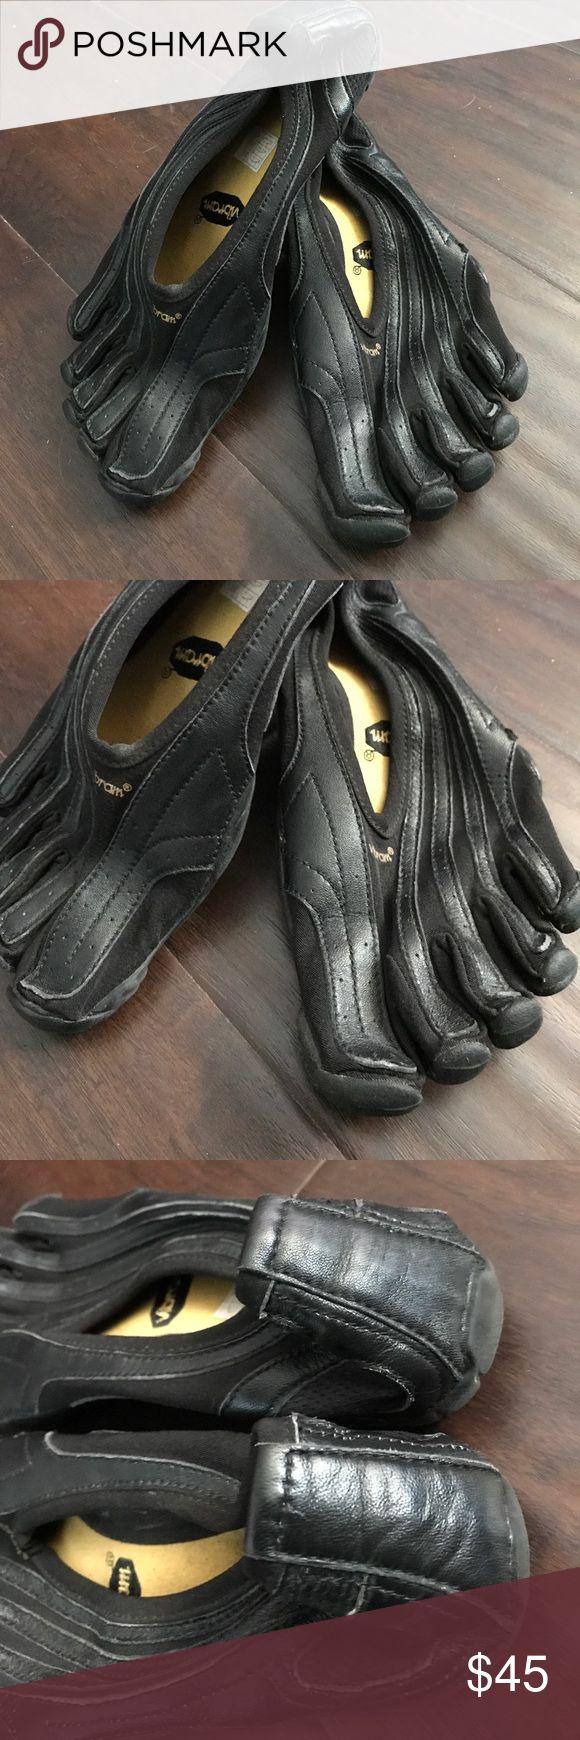 Vibram five fingers woman water shoes size 39 Great unique style vibram shoes with minor dirt inside. Vibram Shoes Sneakers